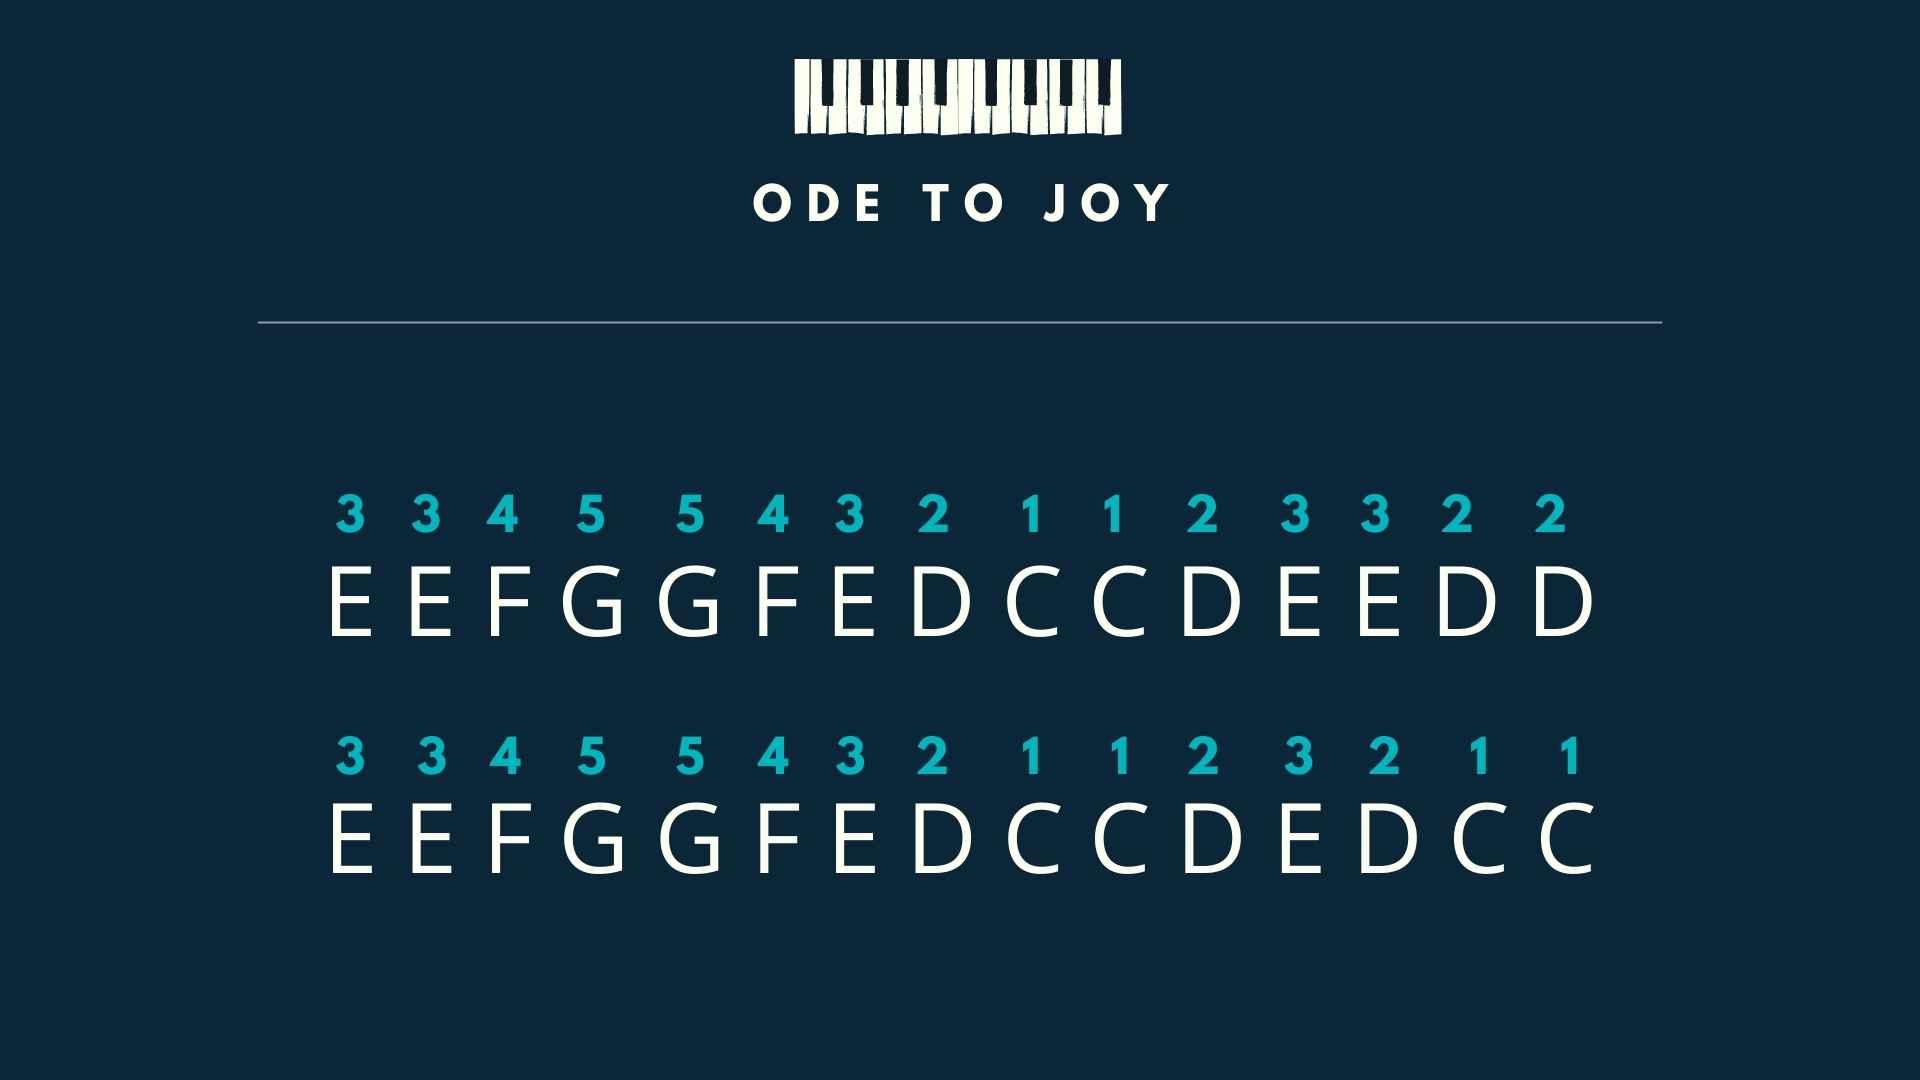 Ode to Joy melody